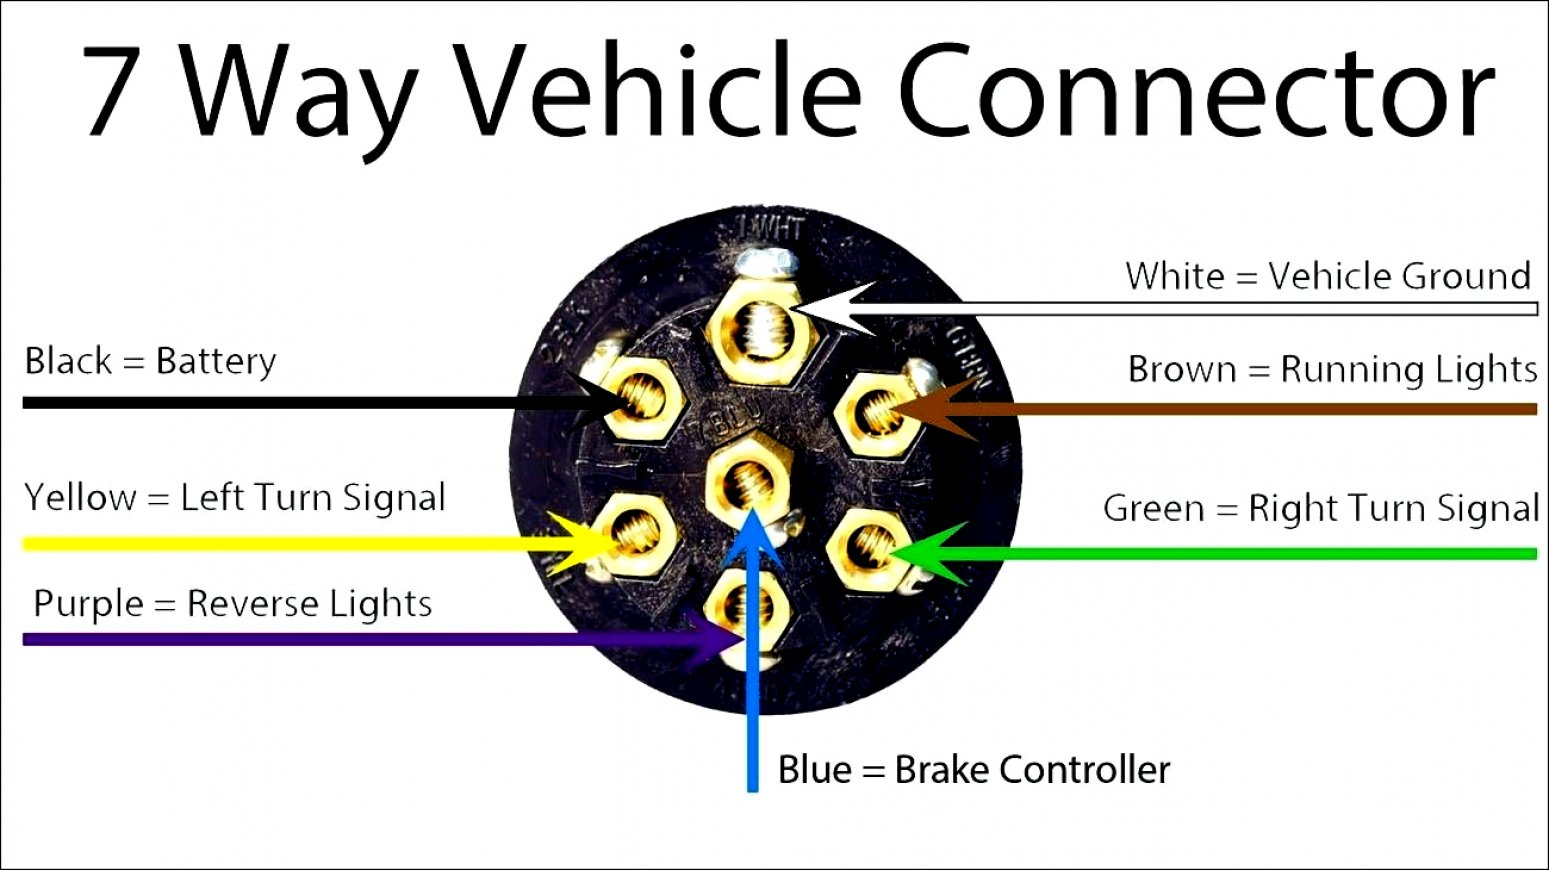 Semi Plug Diagram - Wiring Diagram Data Oreo - Electrical Plug Wiring Diagram